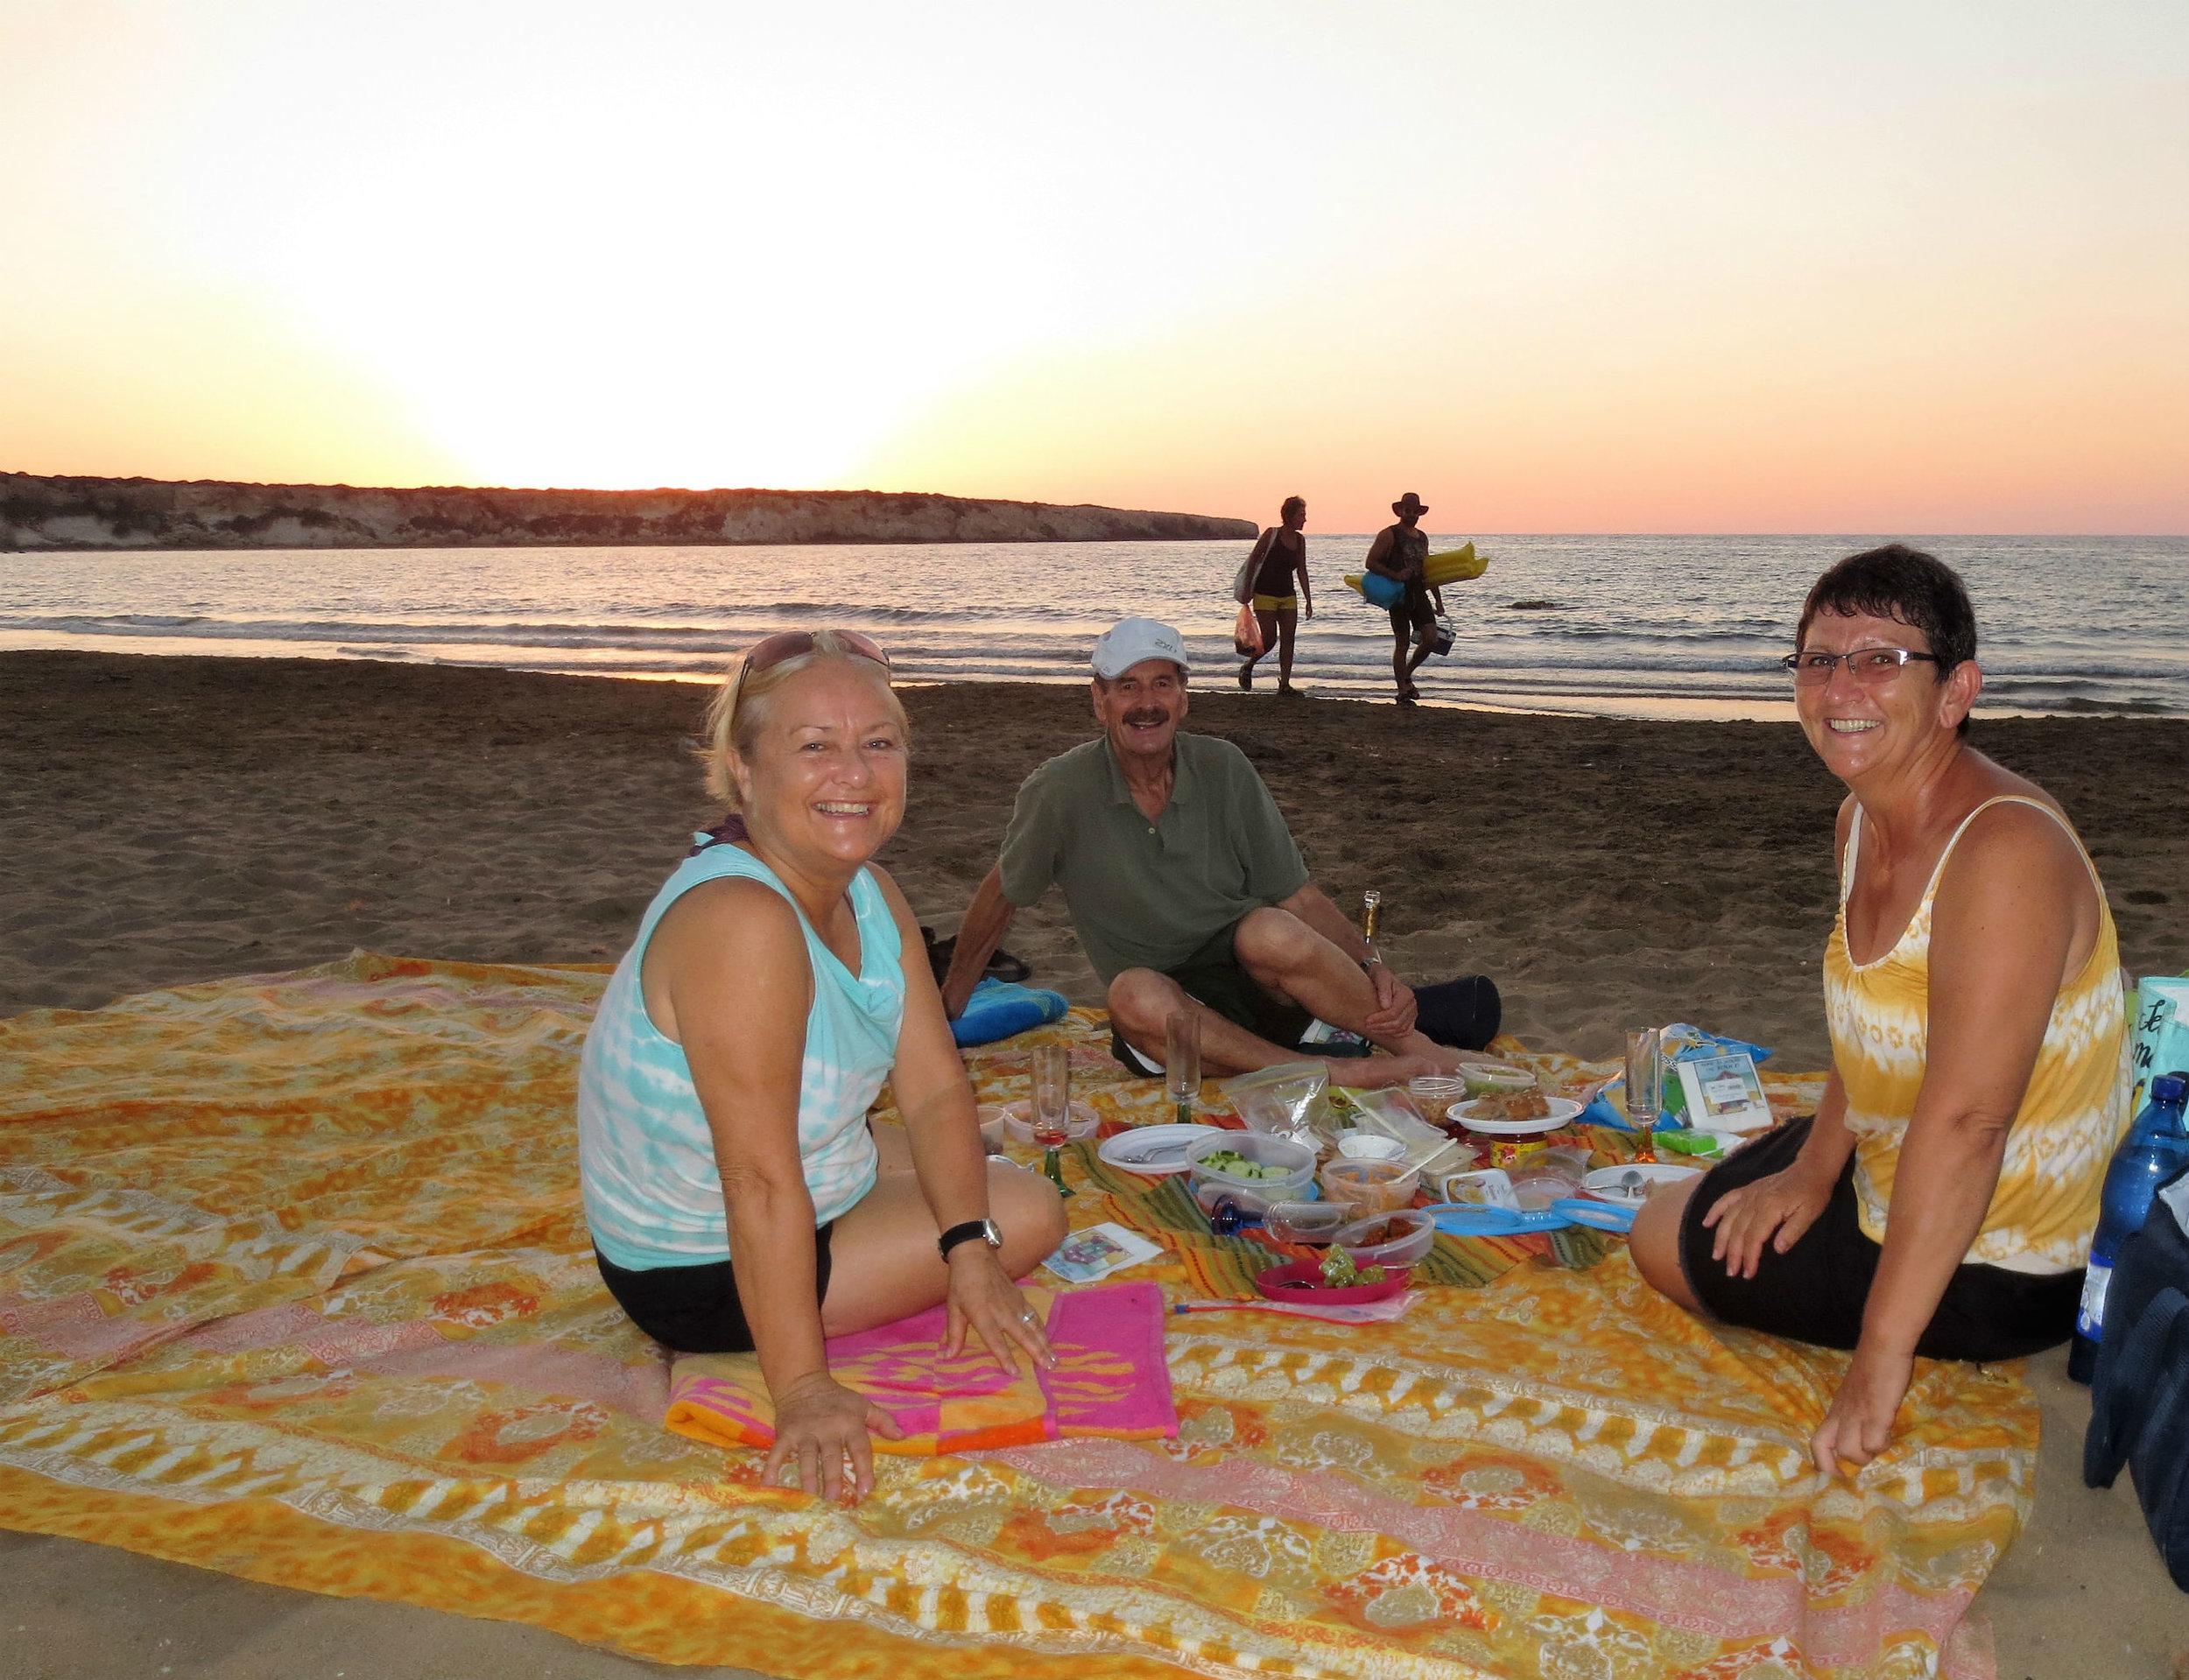 Sundowner on Lara Turtle Beach in Akamas National Park